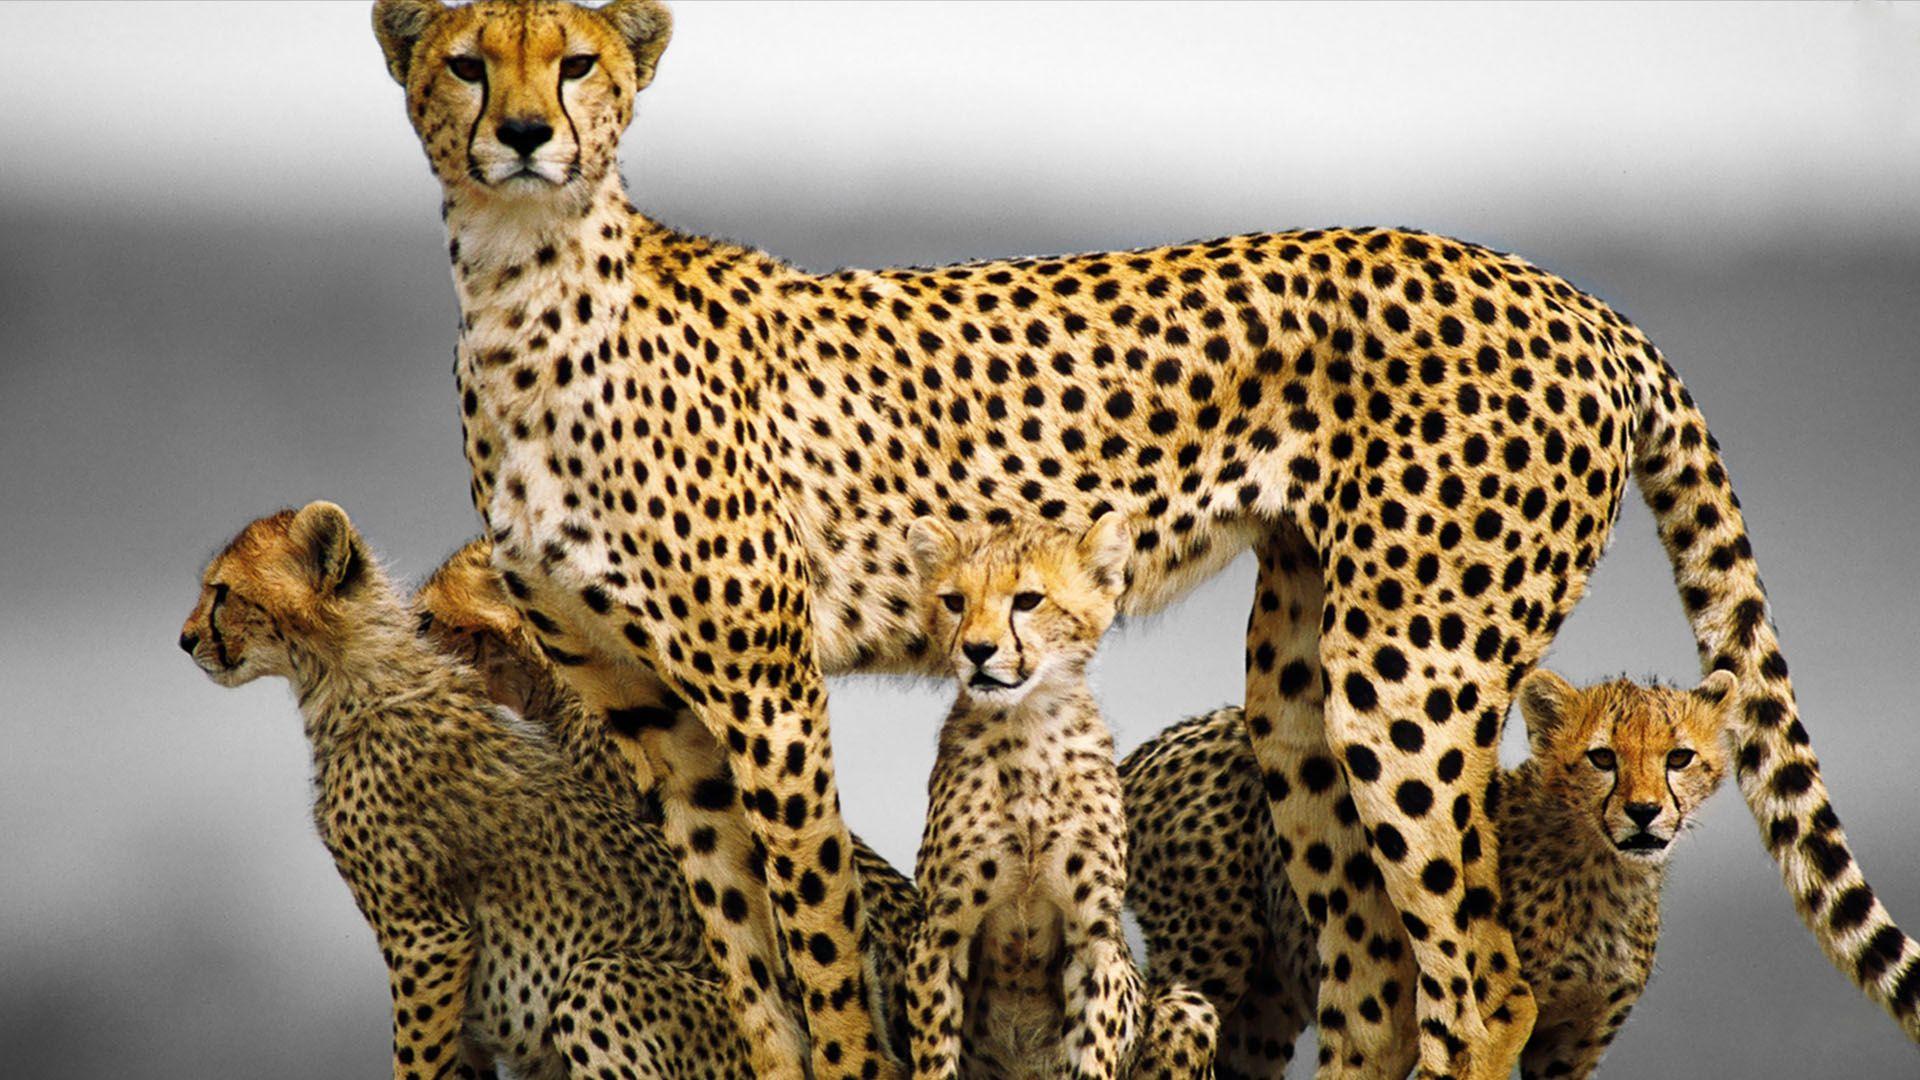 Cheetah And Kittens Desktop Pictures Free Download Cheetah Family Cheetah Wallpaper Animals